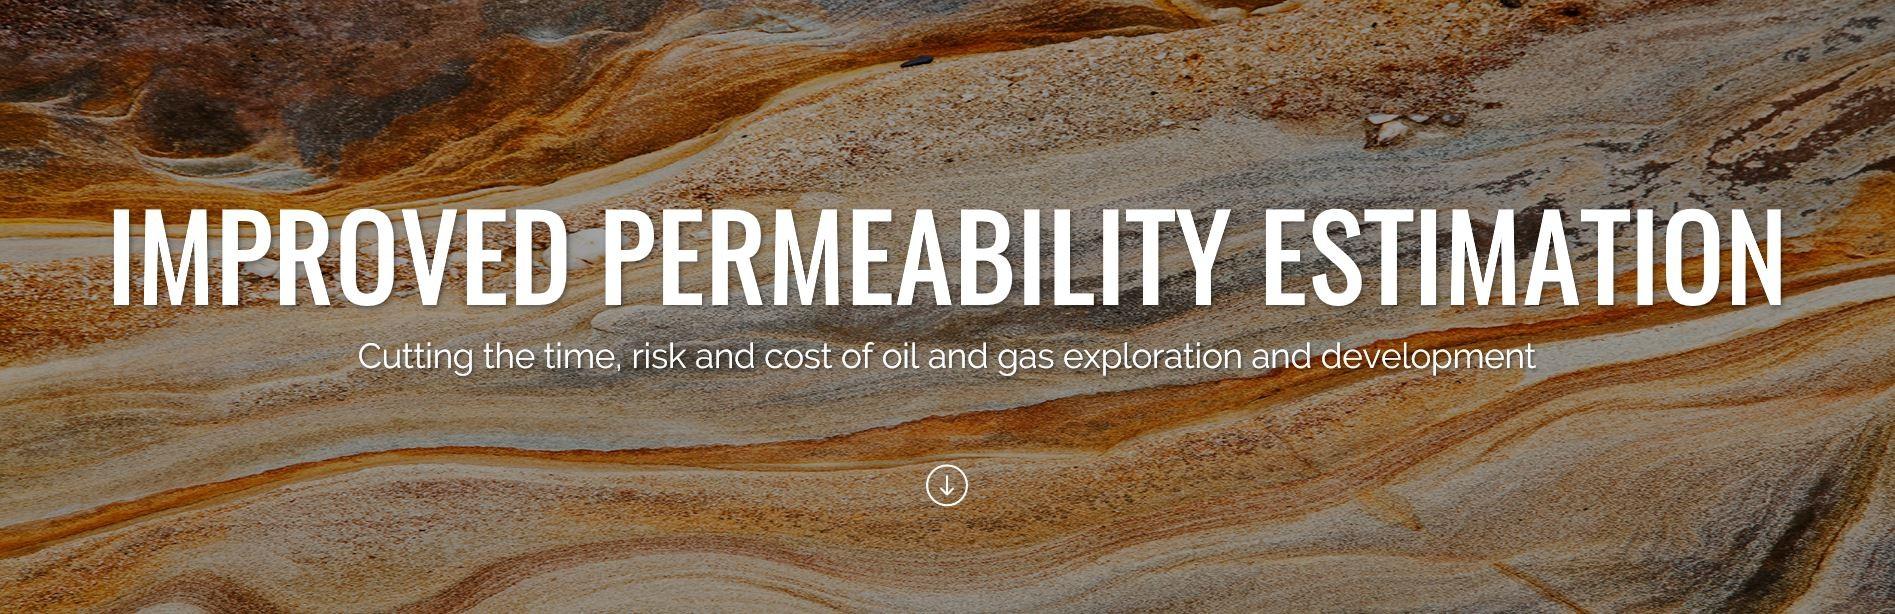 Advanced Downhole Petrophysics Ltd | LinkedIn